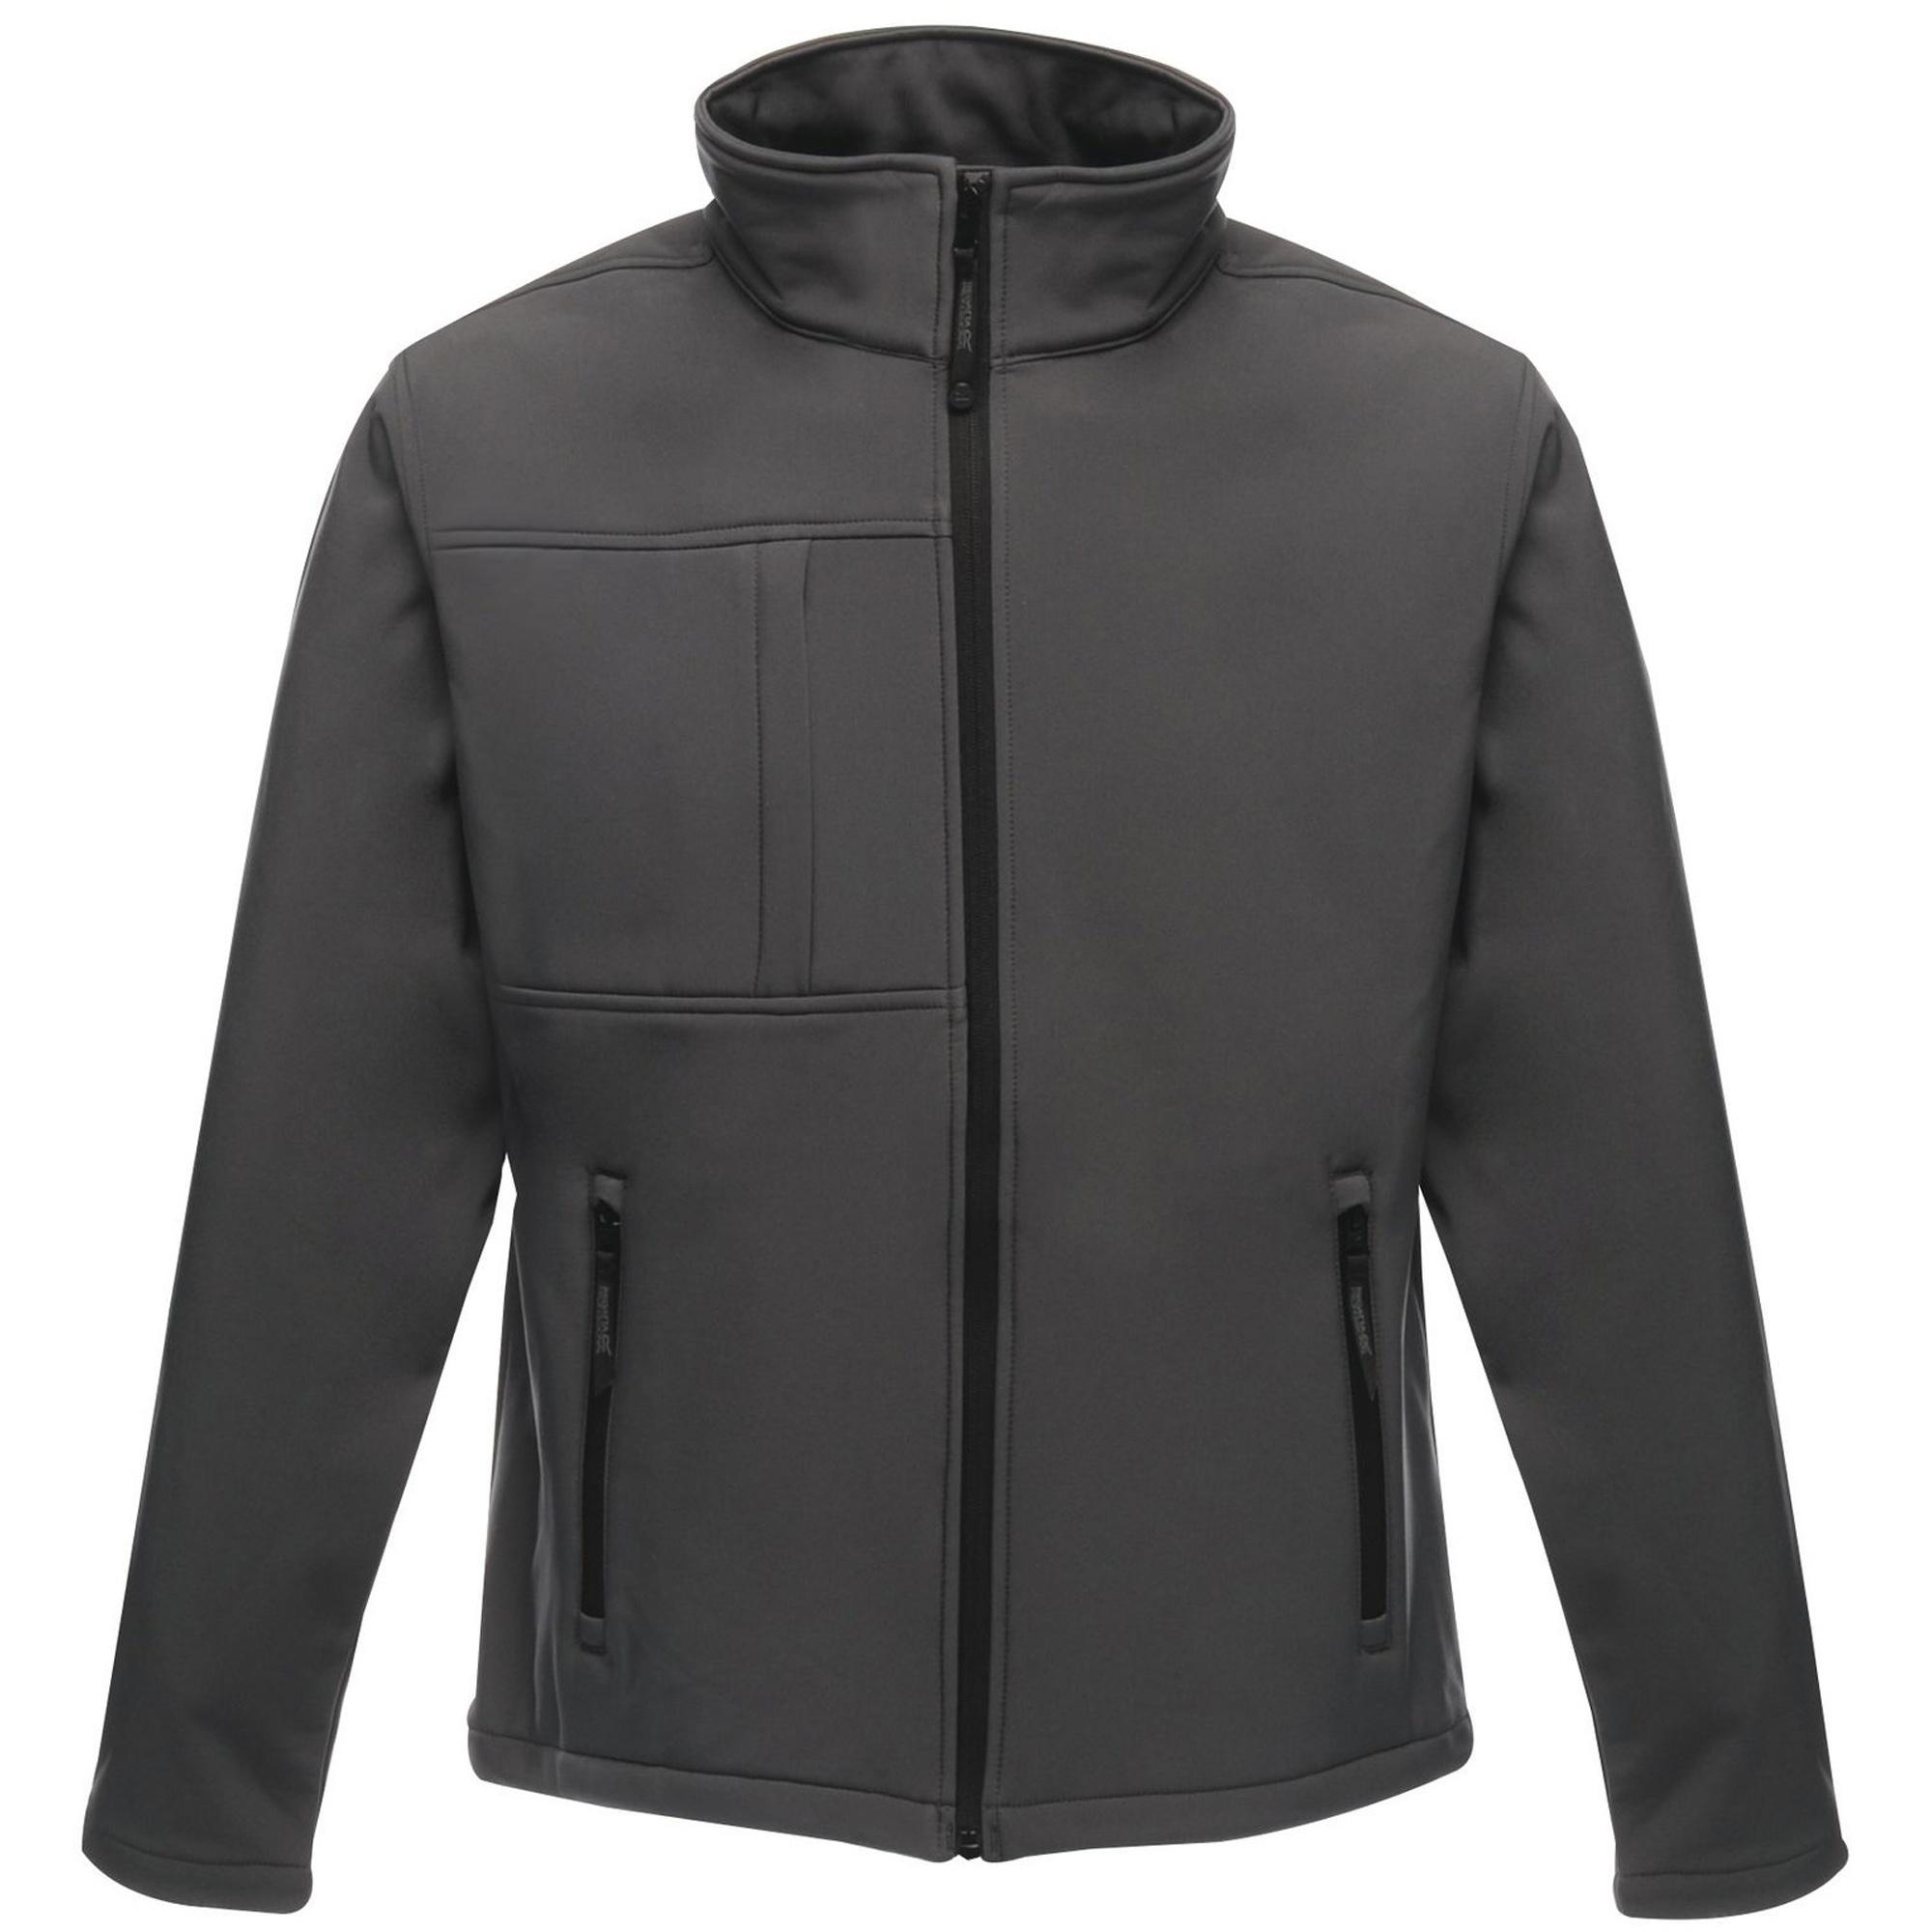 Mens regatta jacket - Regatta Professional Mens Octagon Ii Waterproof Softshell Jacket